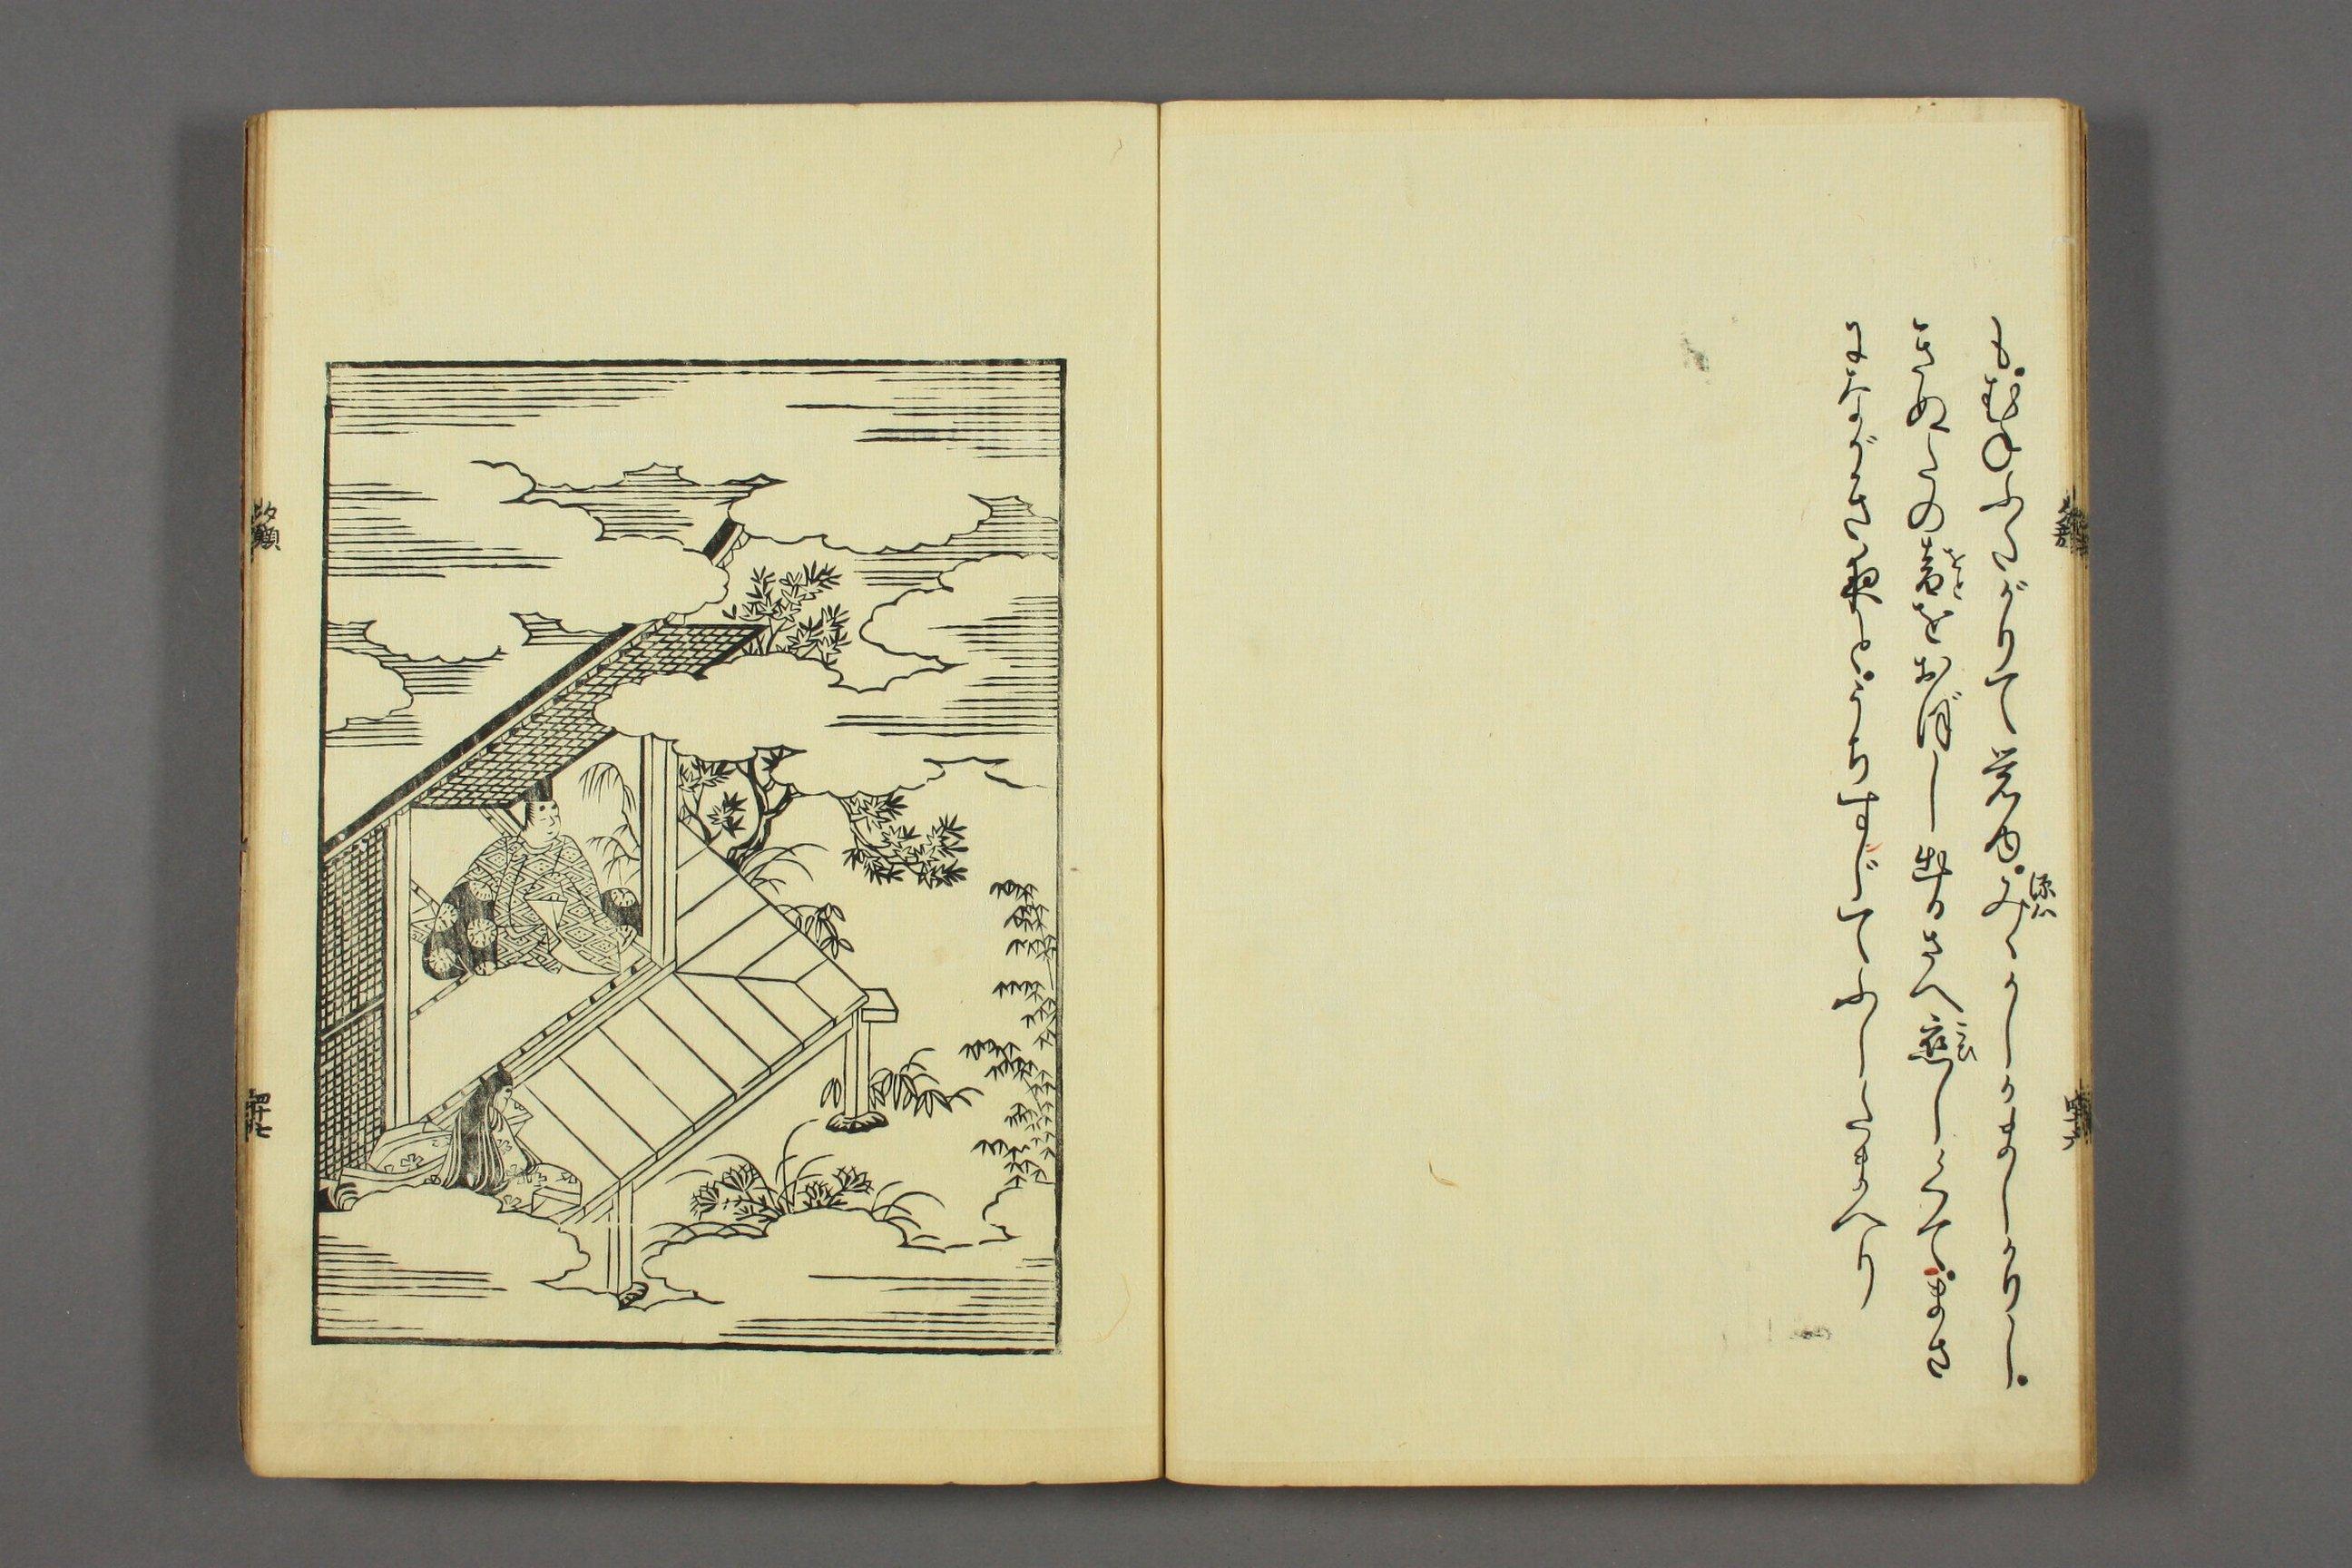 http://archive.wul.waseda.ac.jp/kosho/bunko30/bunko30_a0007/bunko30_a0007_0004/bunko30_a0007_0004_p0048.jpg